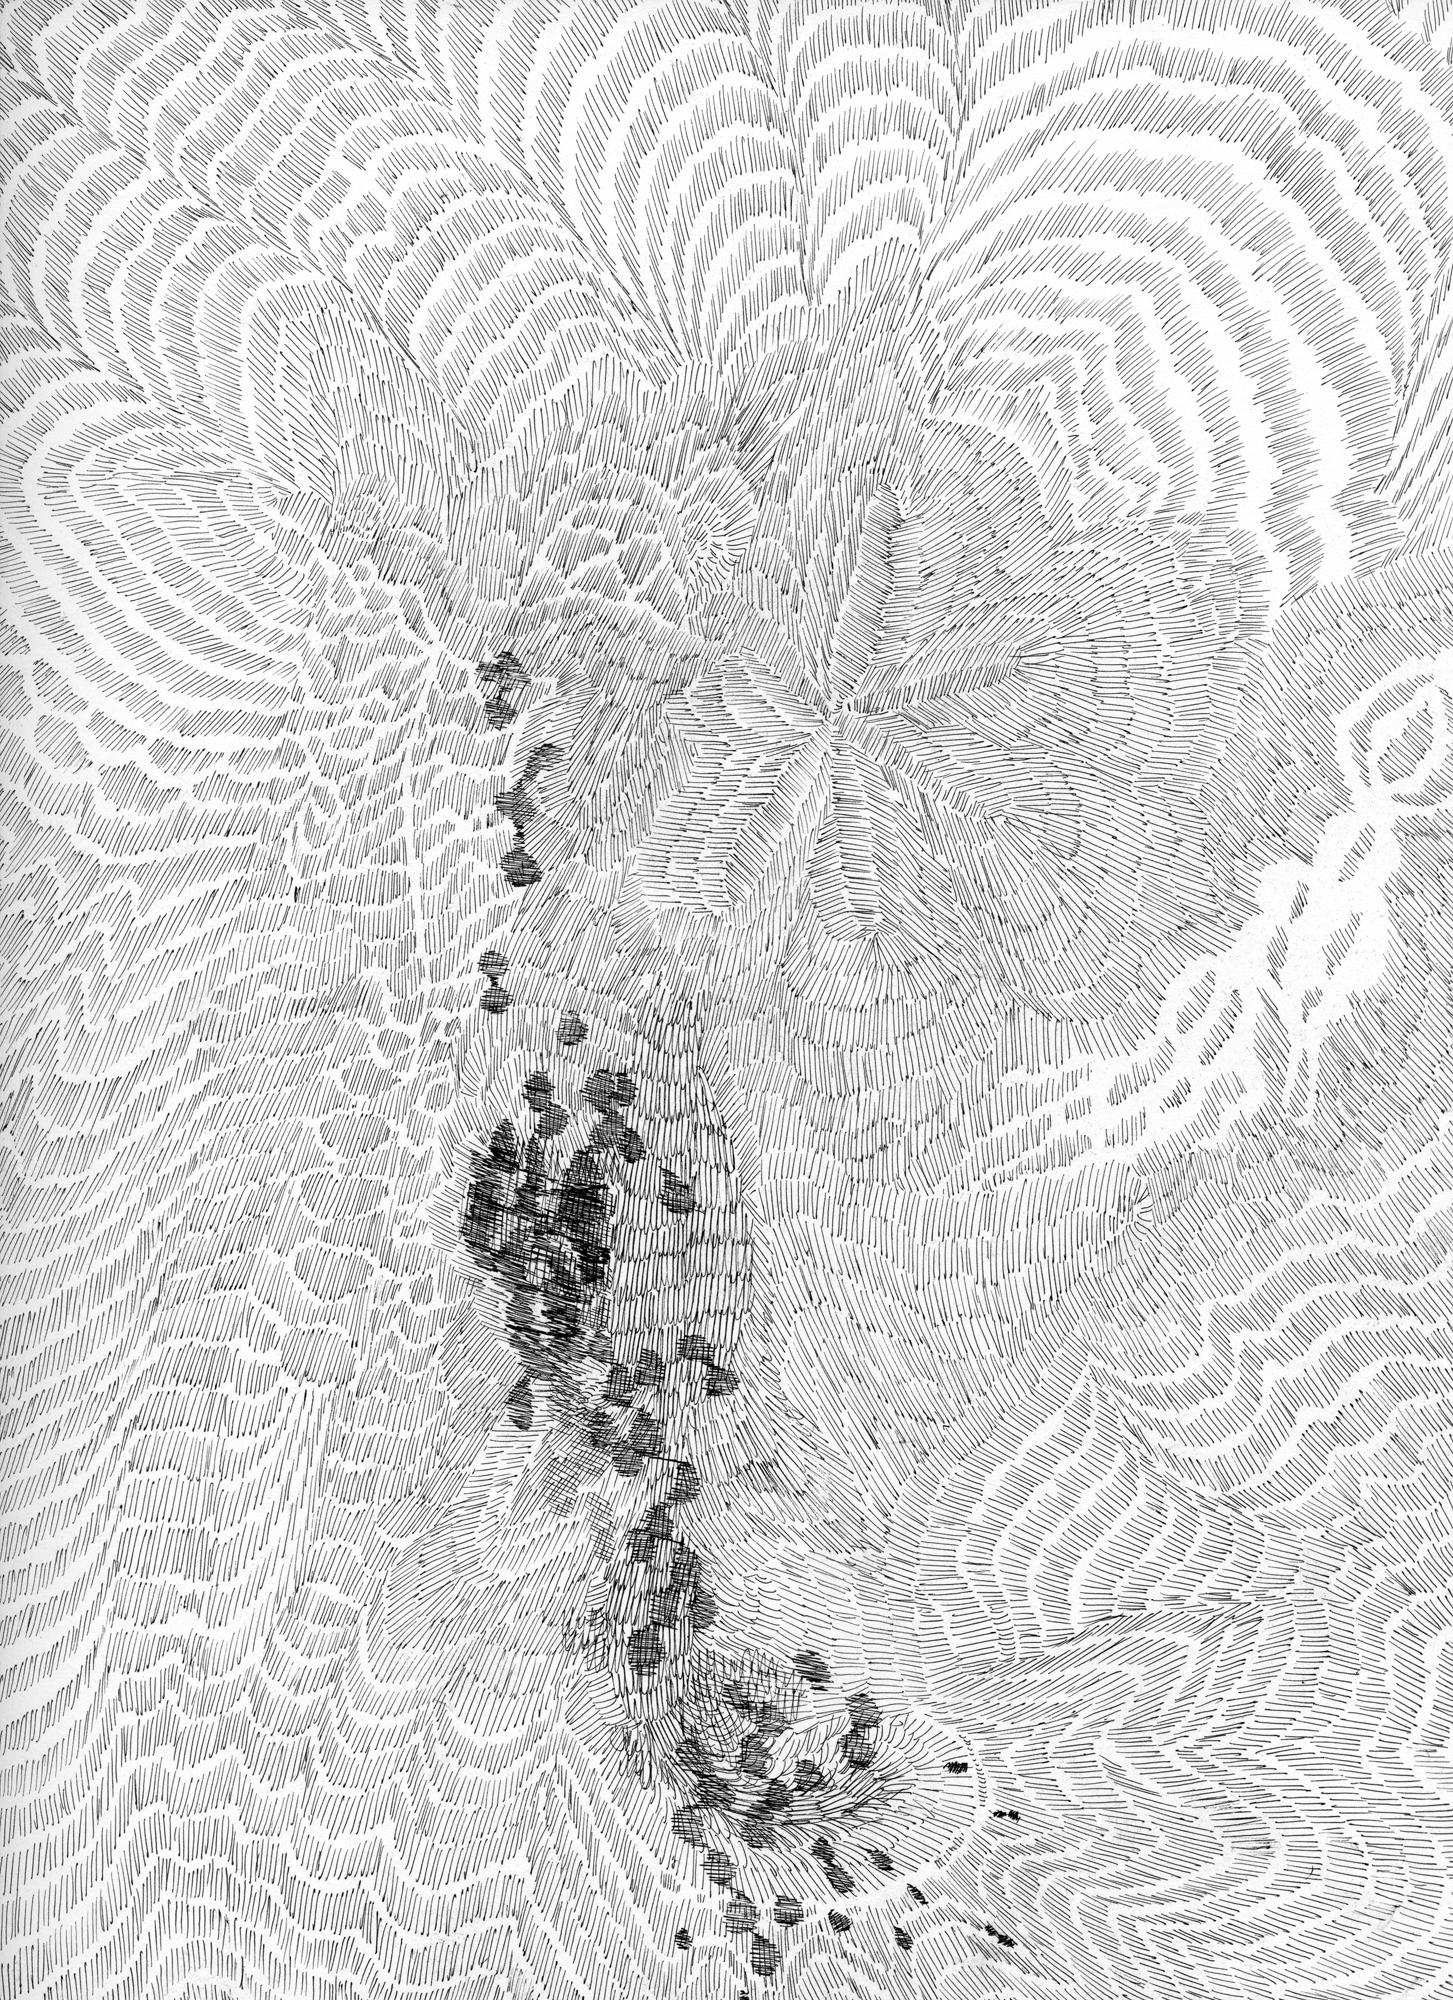 Untitled (Flux 04.14) , 2019 Ink on paper 30.4 cm x 22.8 cm